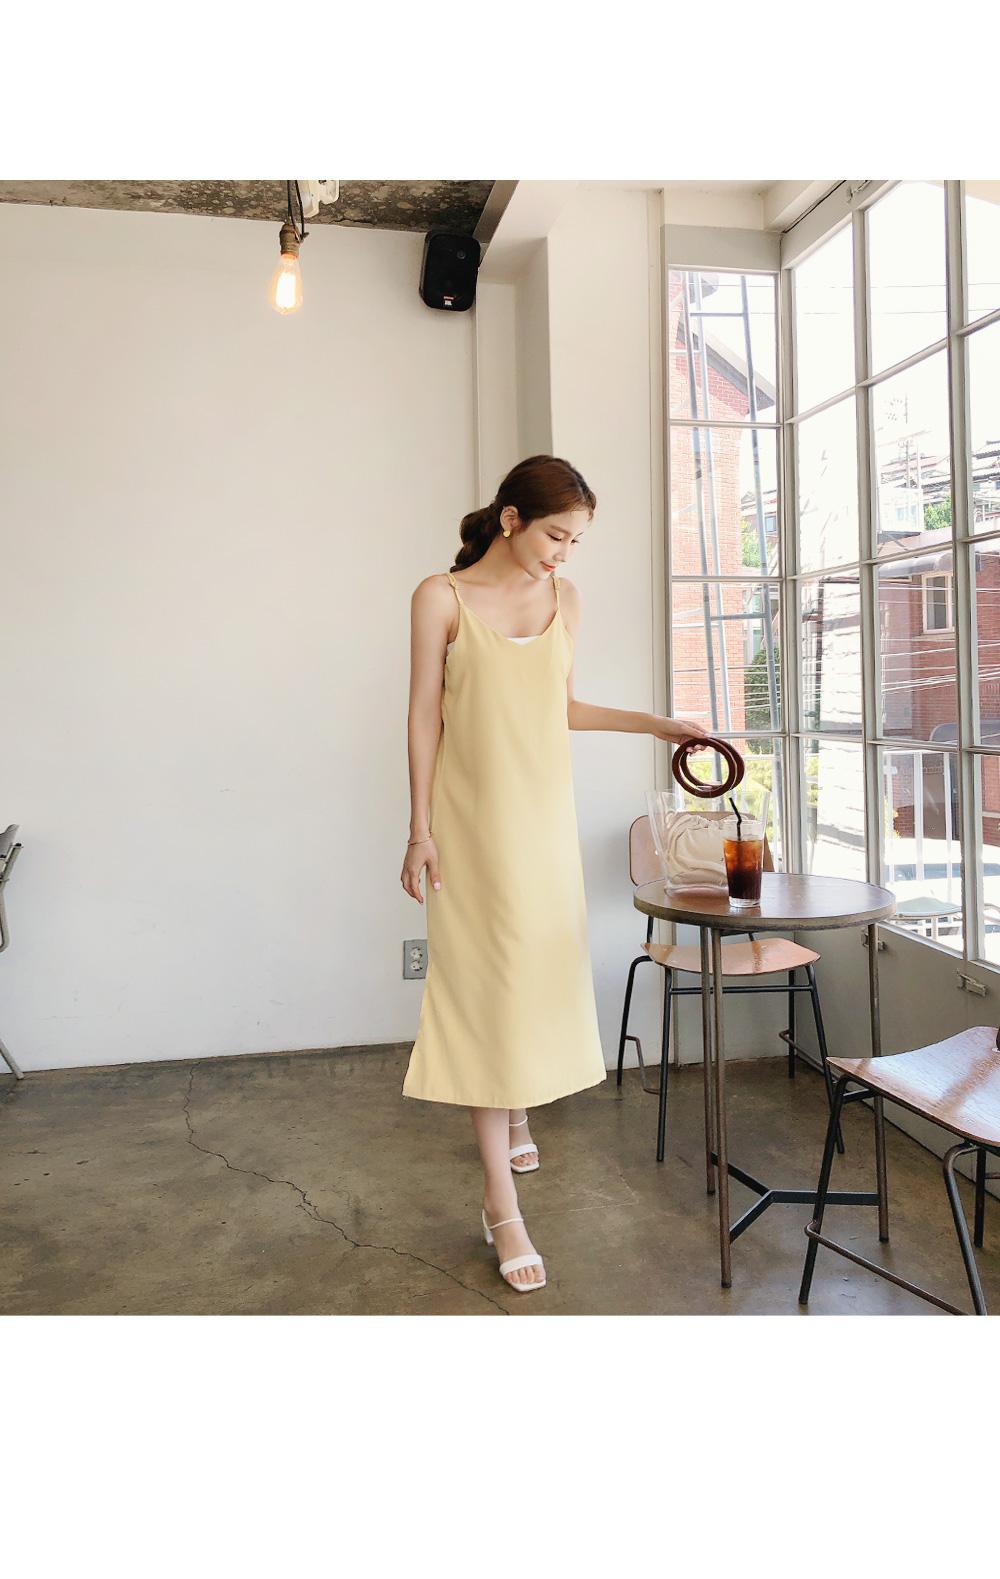 Pure Yellow Dress